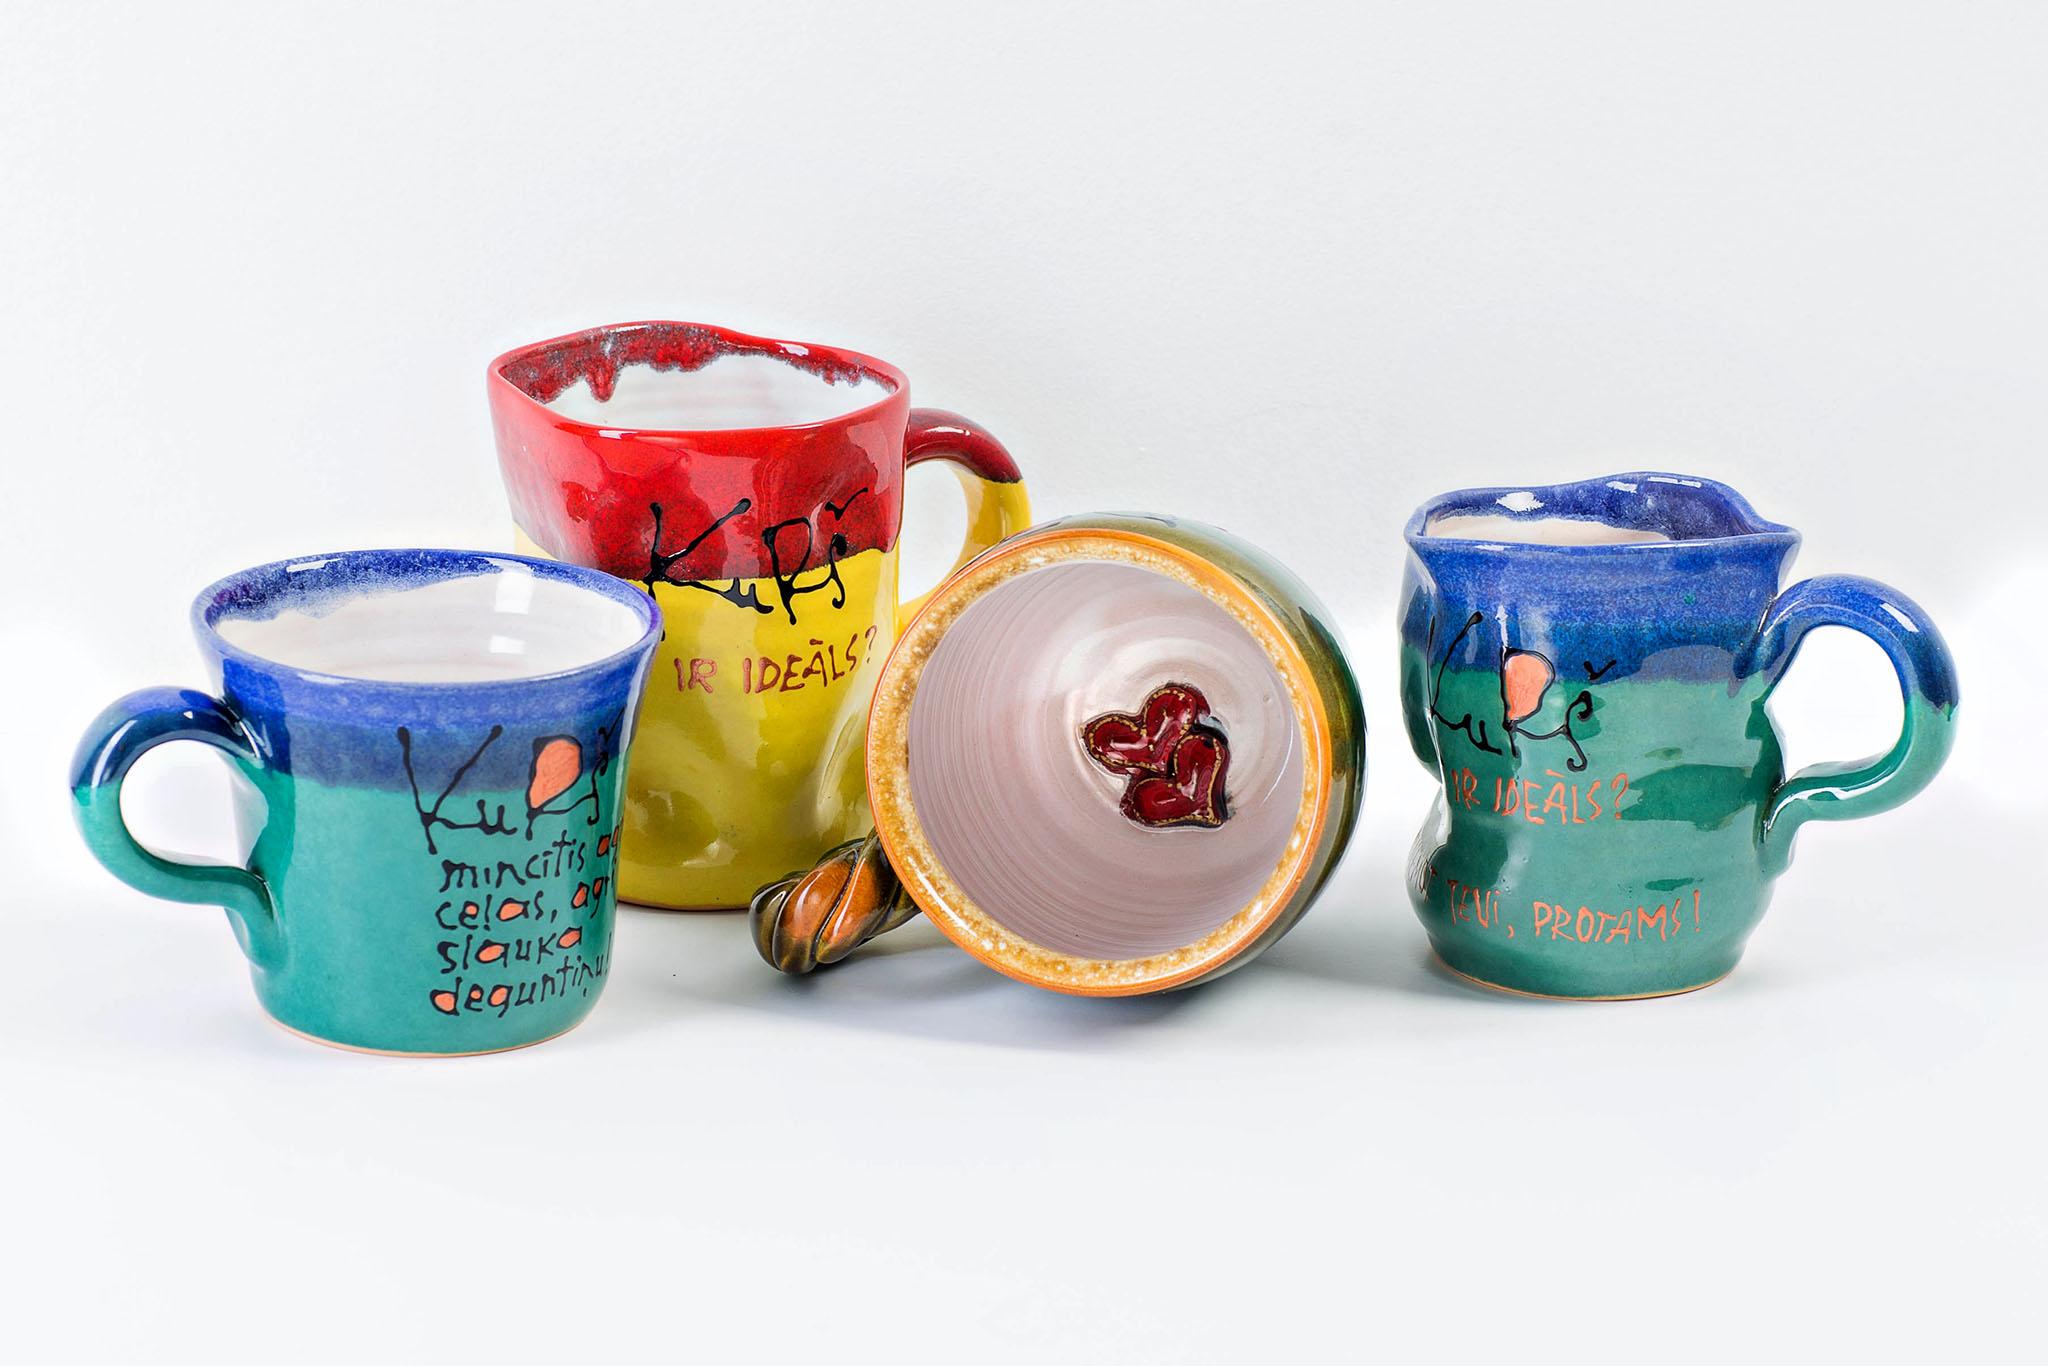 virzas_keramika_attelsv2 (4)